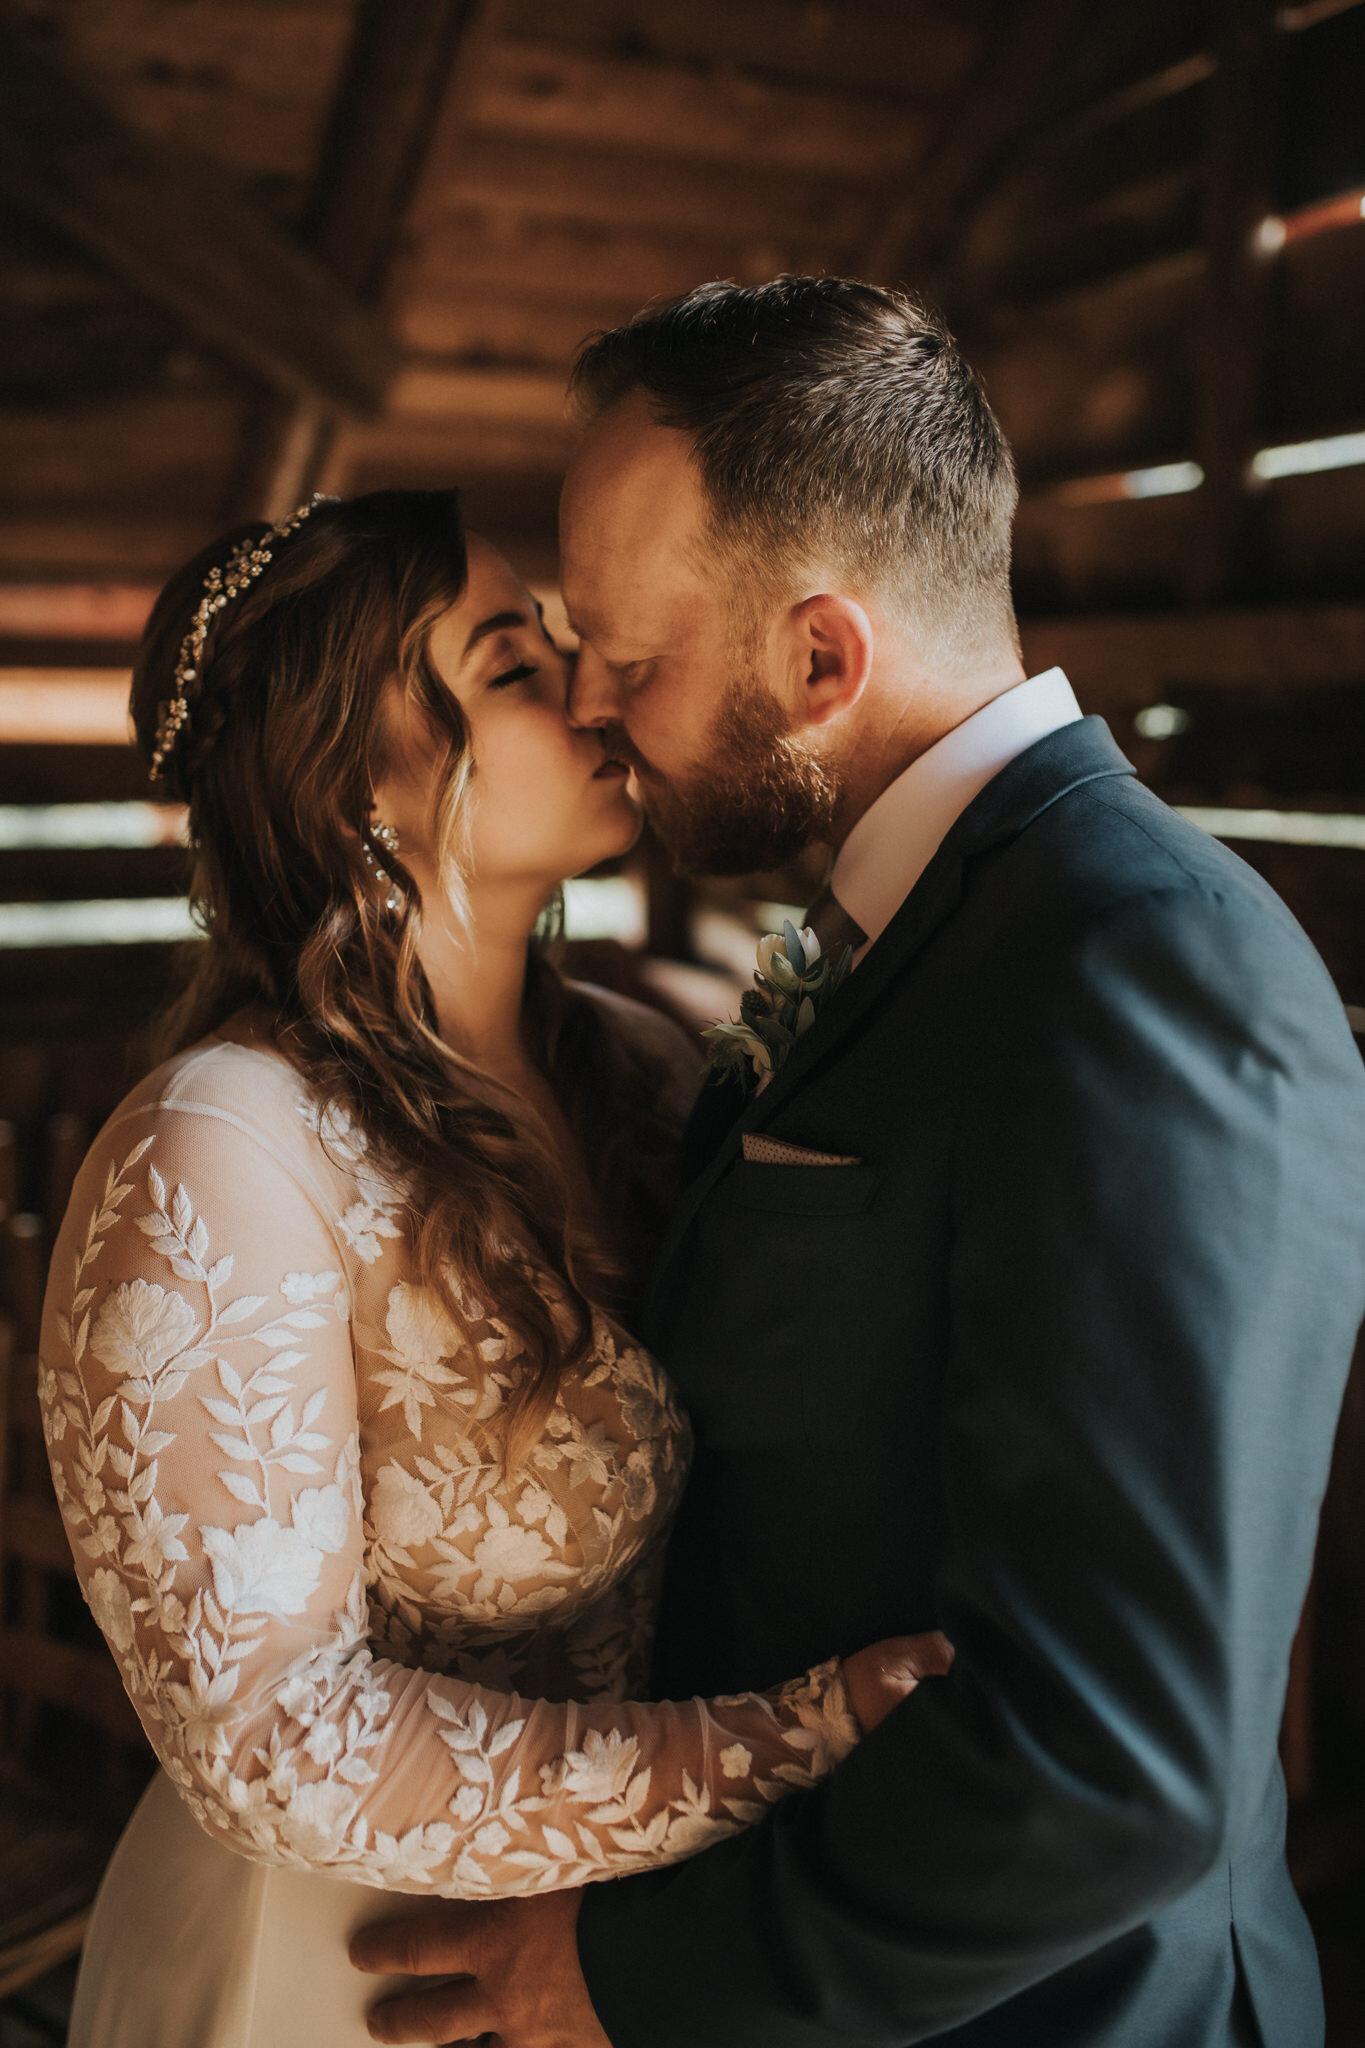 KateMatt-North-Georgia-Wedding-Photographer-Mountain-Laurel-Farm-121.jpg